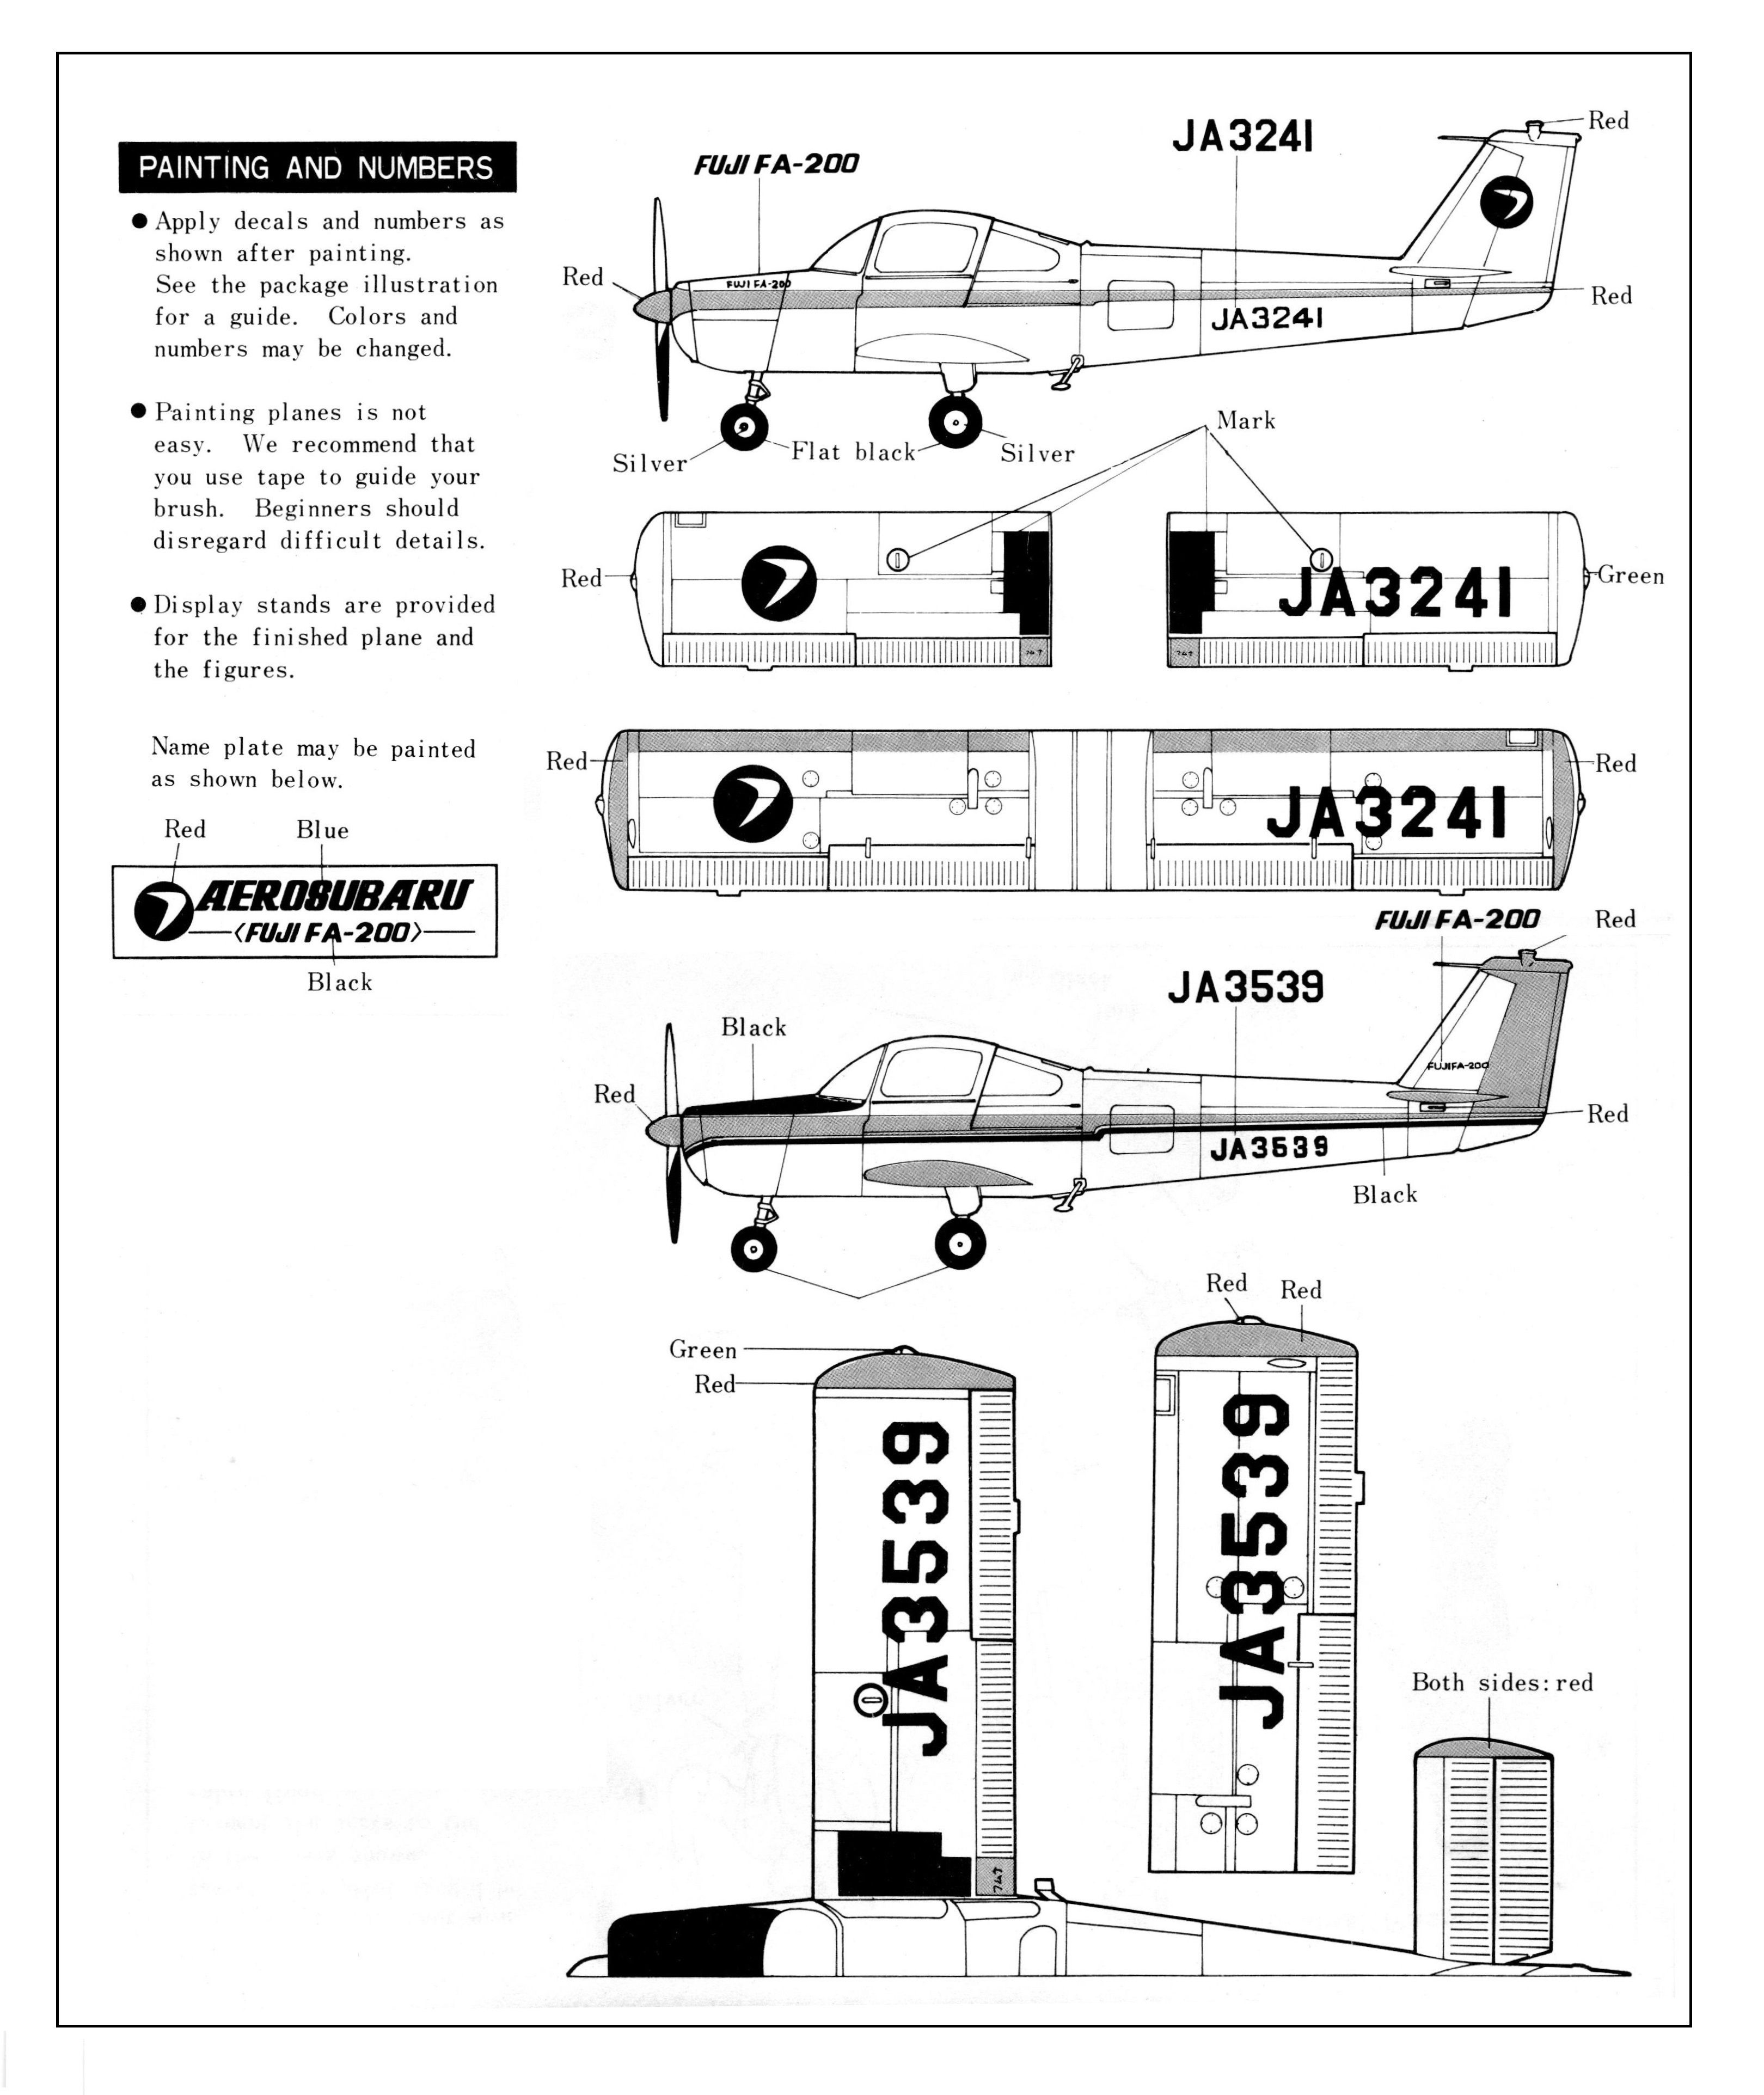 Pin by Gluefinger on Bandai 1/48 Aero Subaru (Fuji FA-200